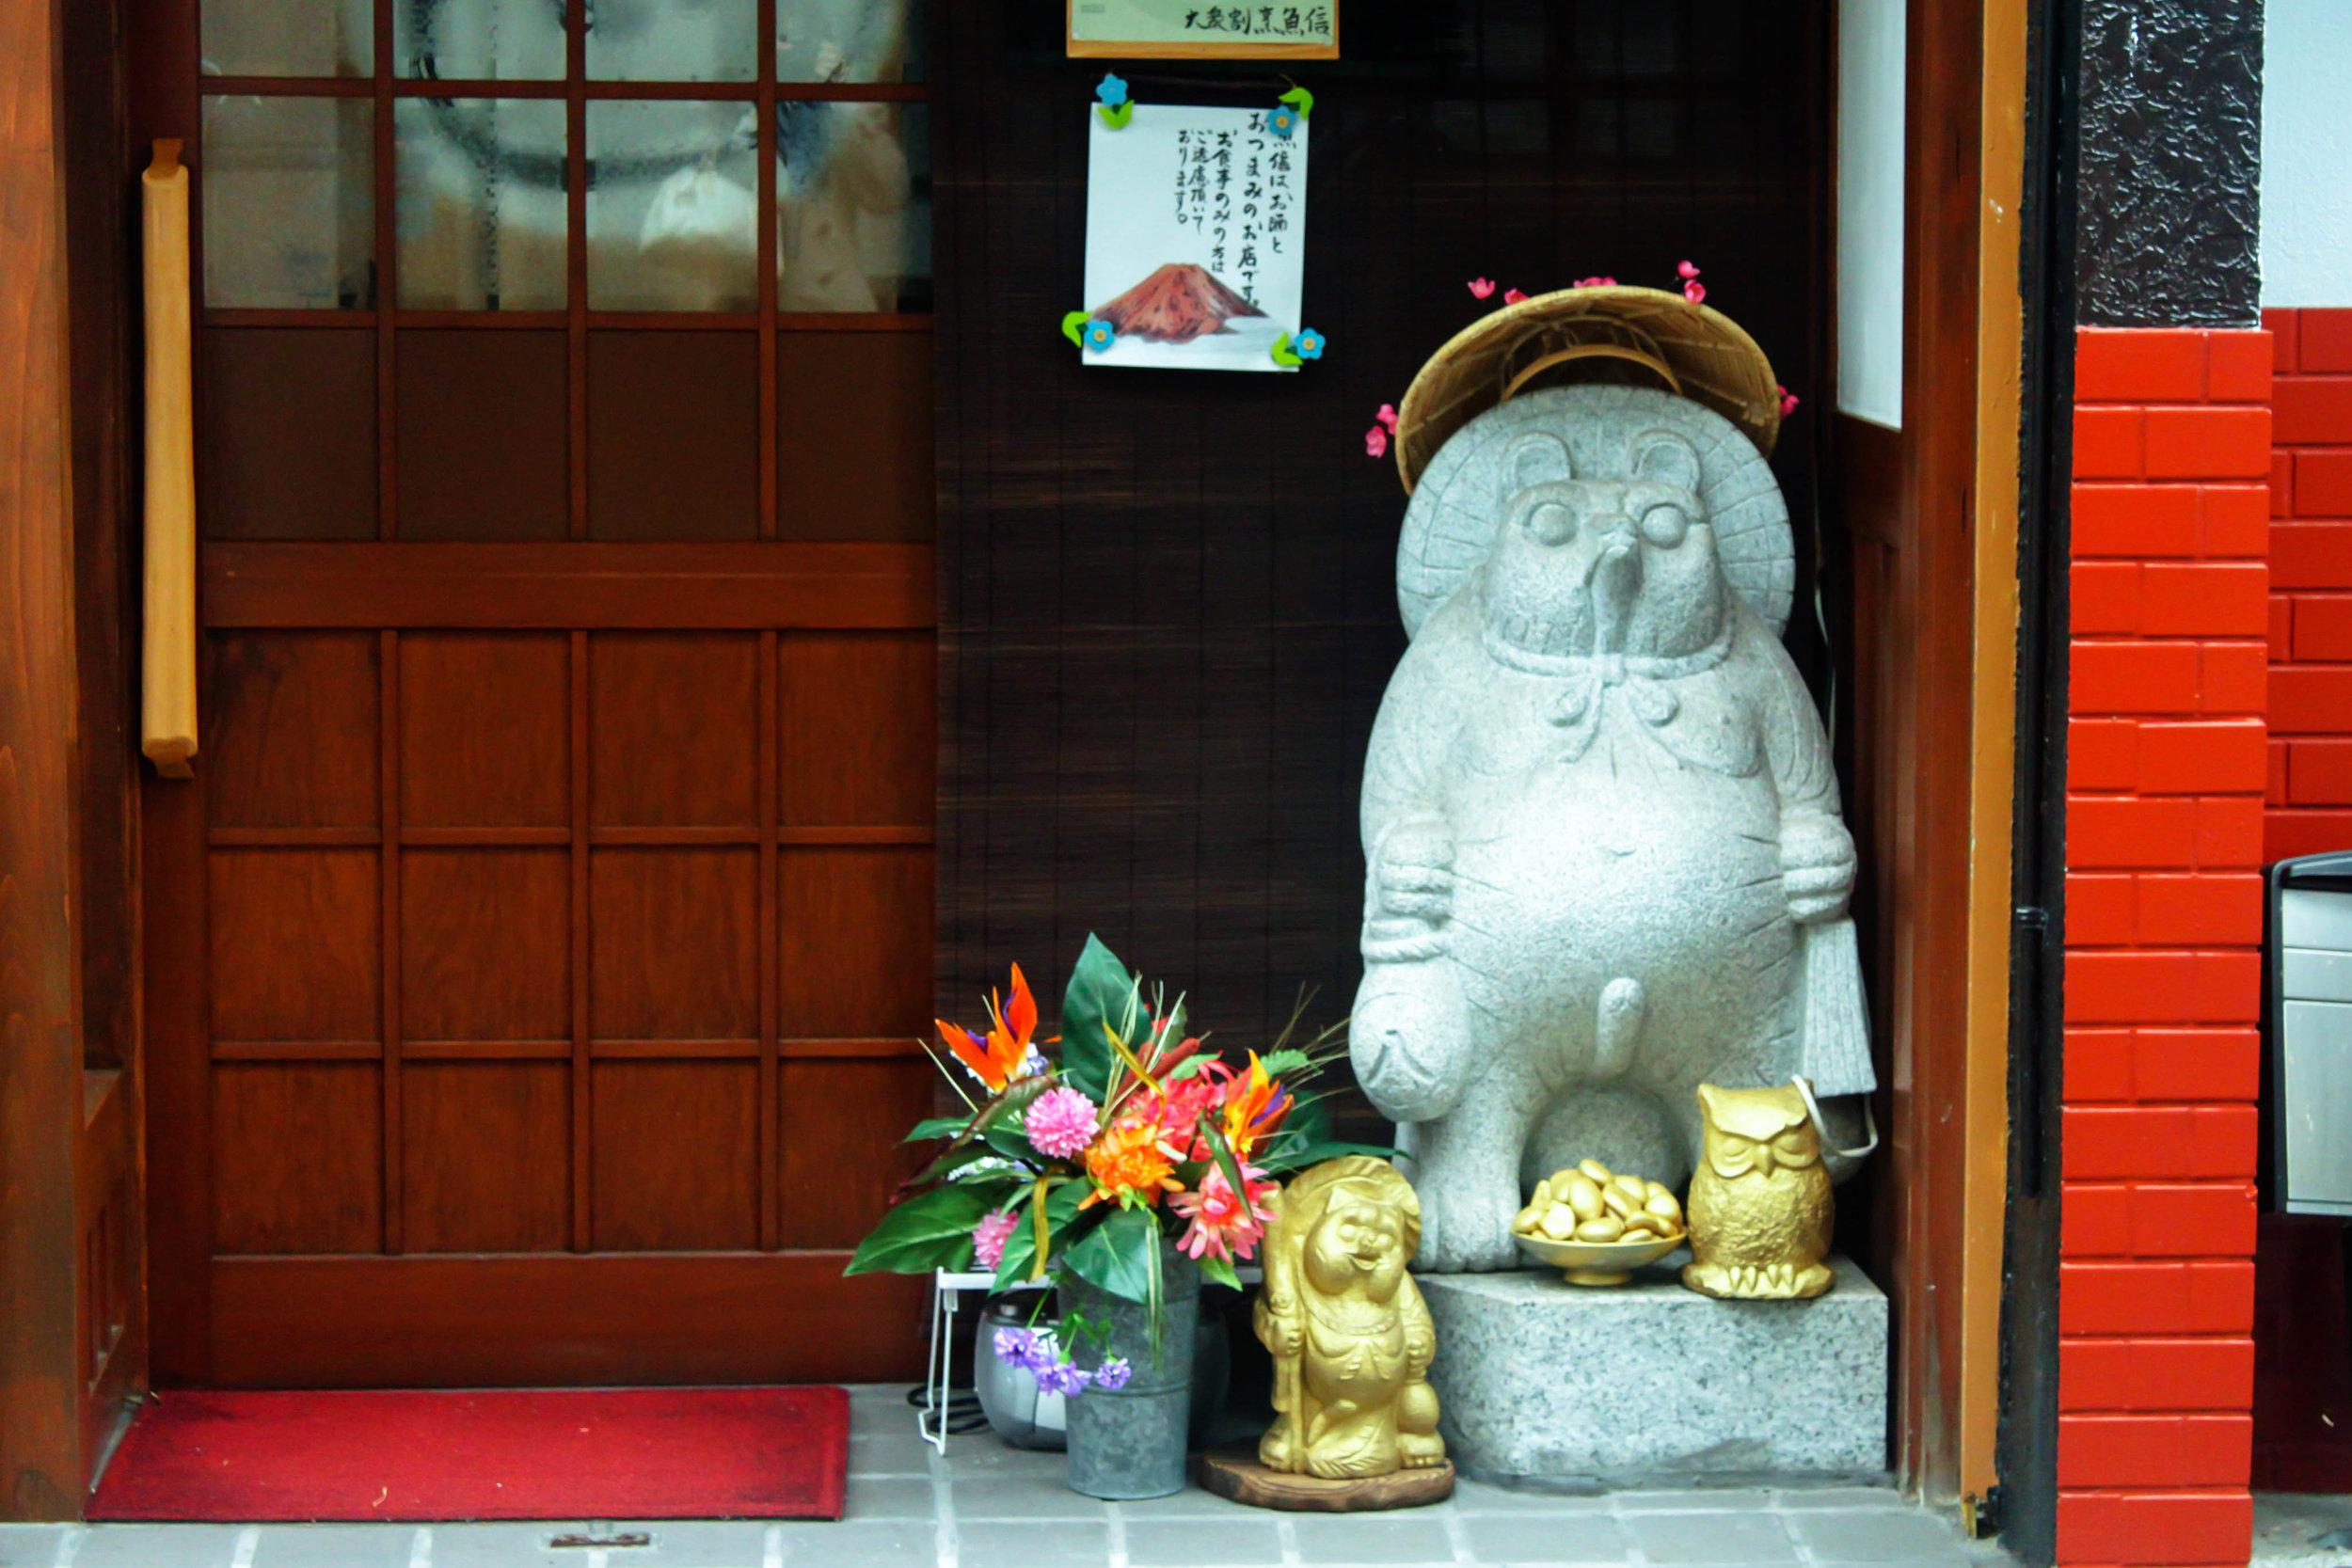 Tanuki storefront statues.